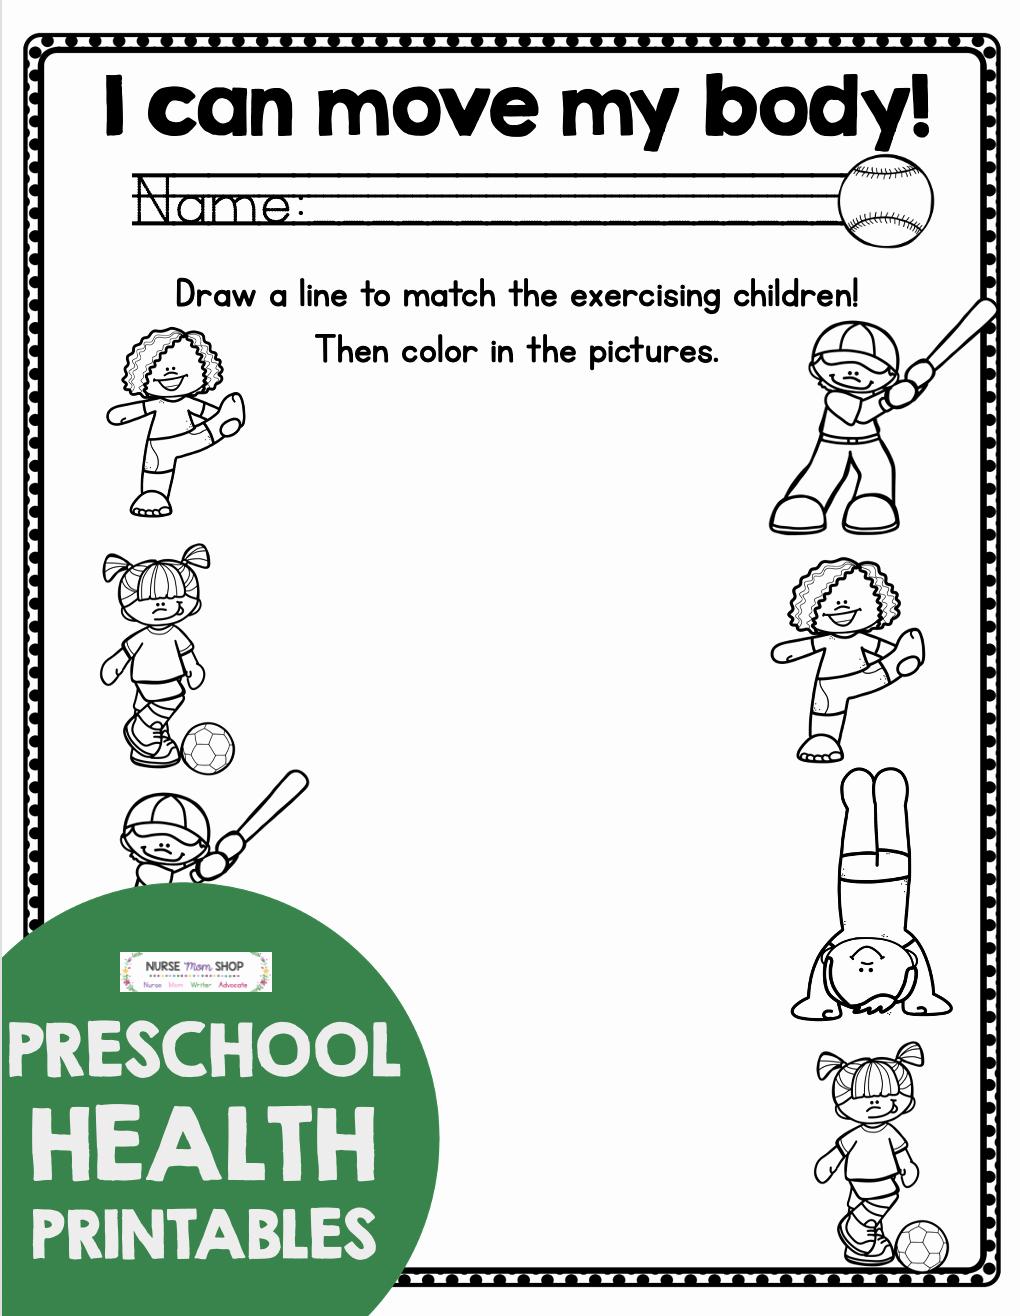 Free Printable Health Worksheets Luxury Free Health and Nutrition Preschool and Kindergarten